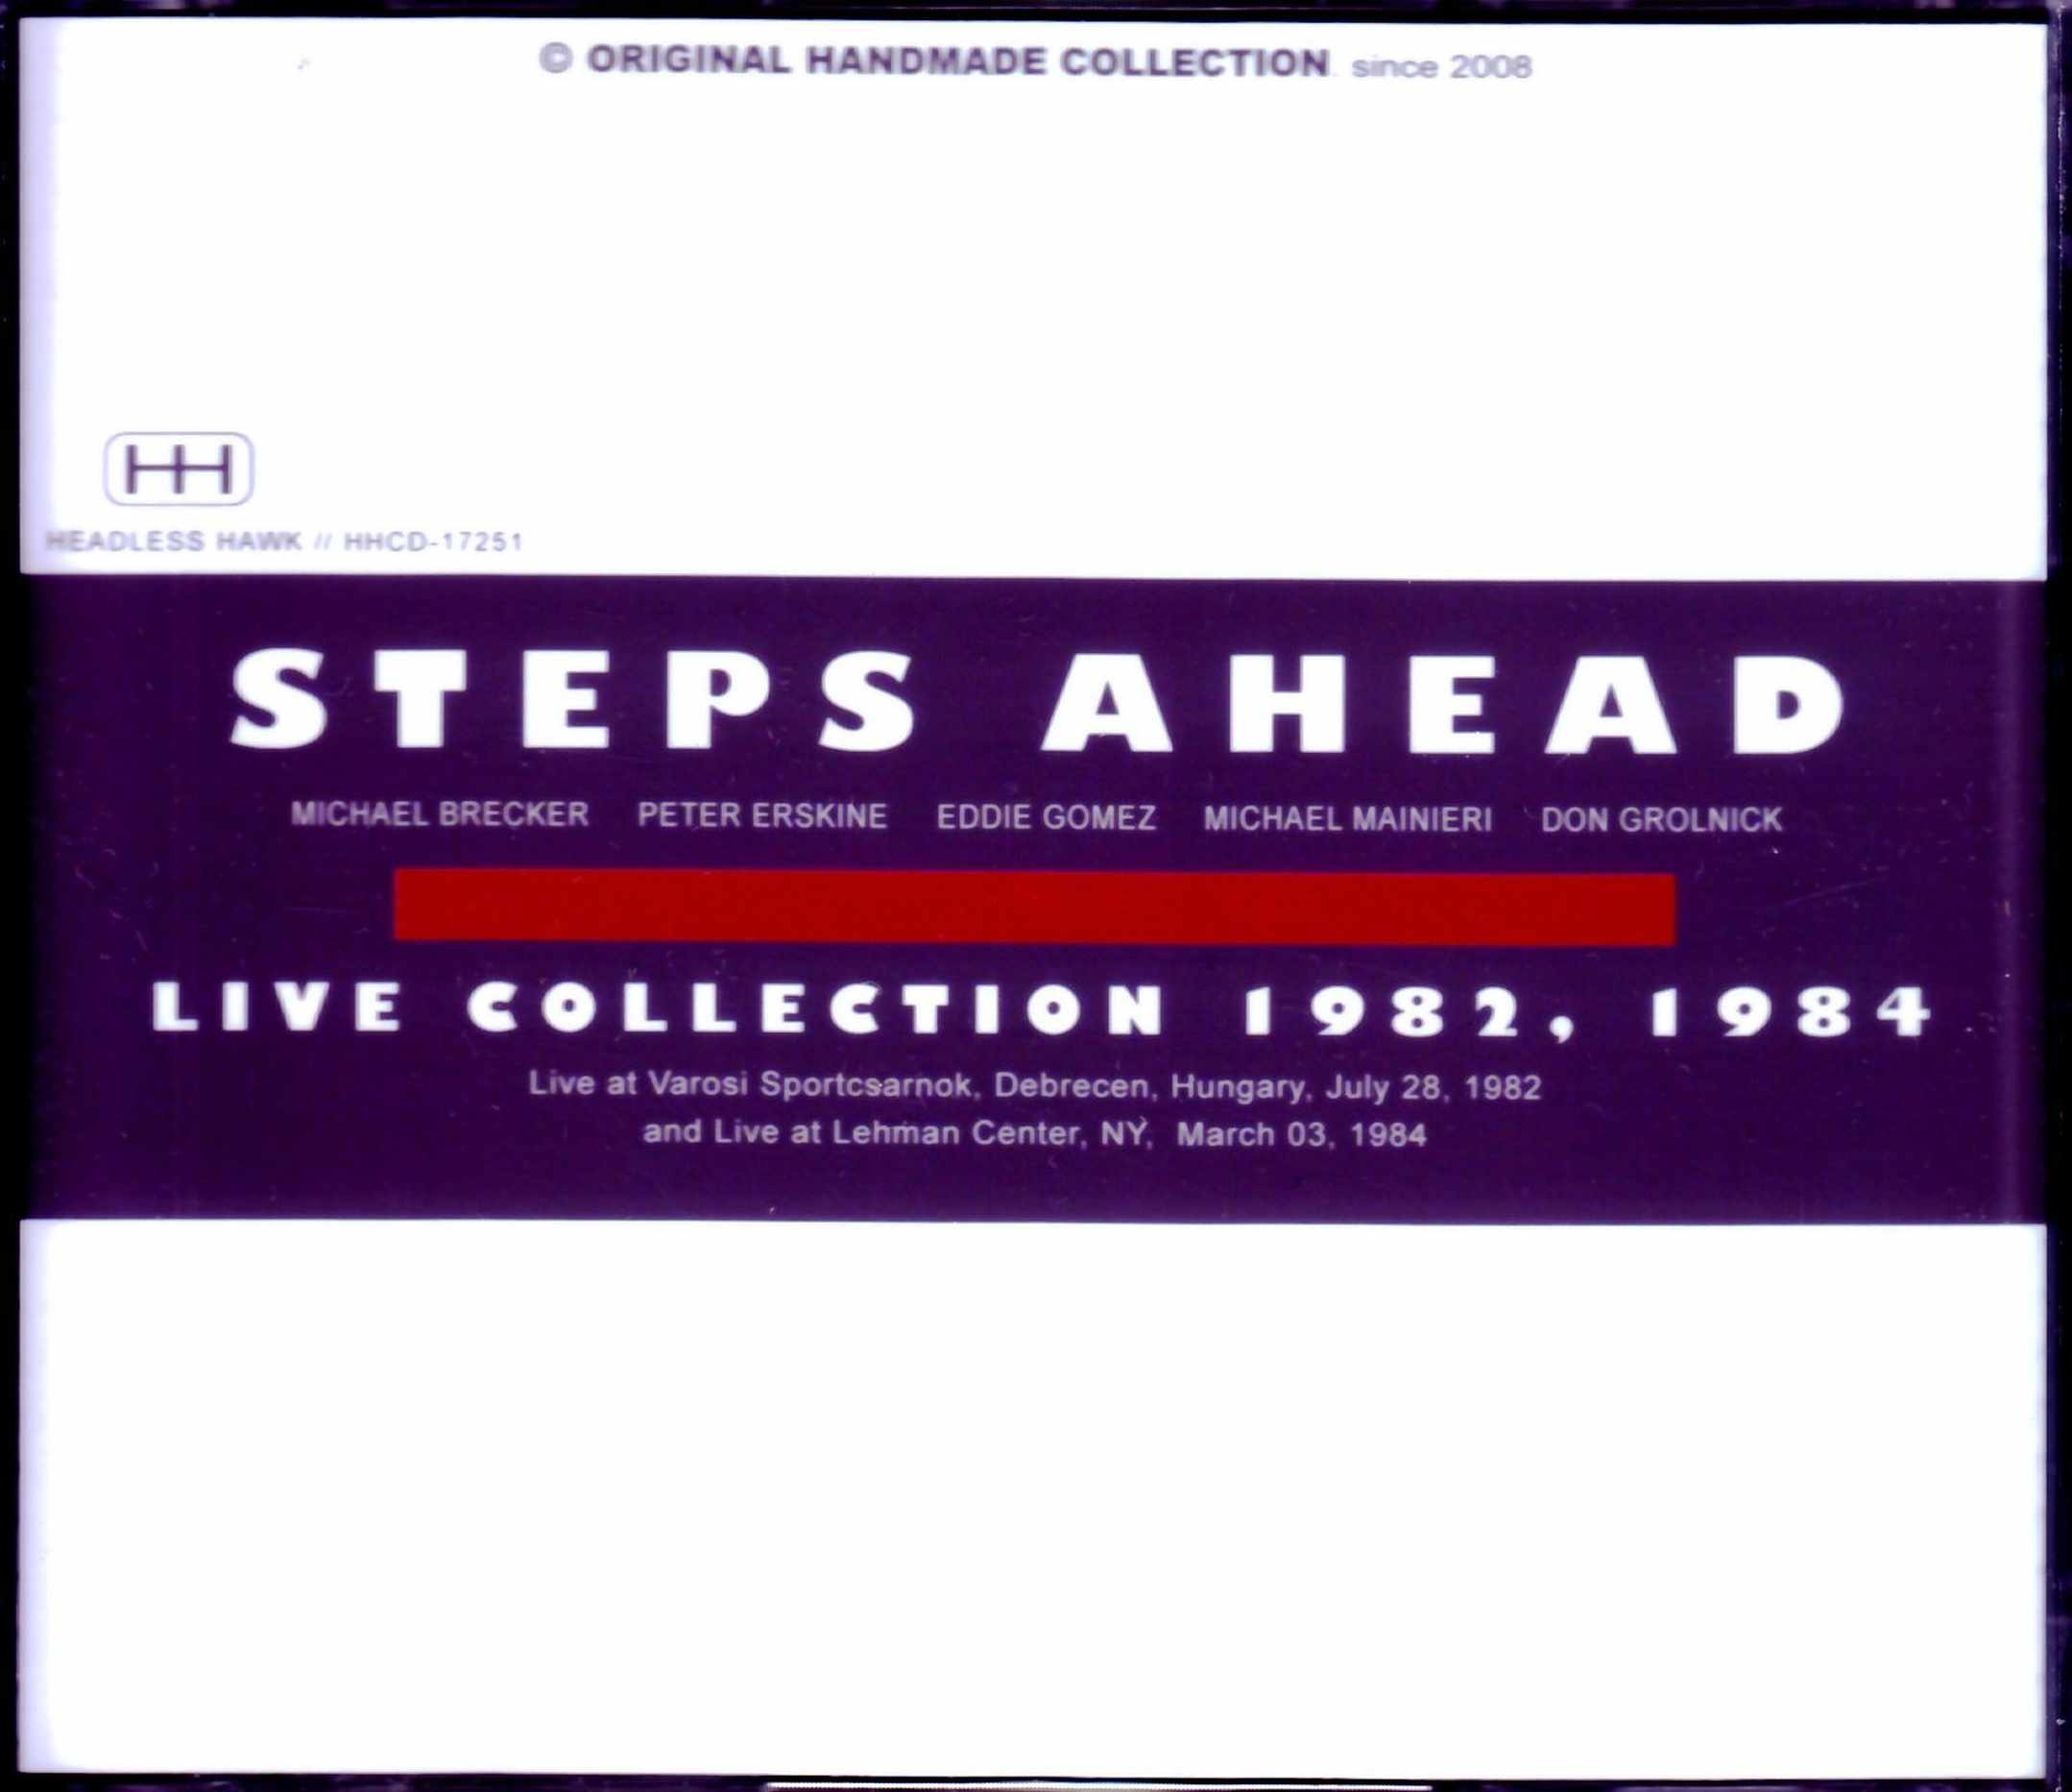 Steps Ahead,Michael Brecker,Mike Mainieri,Don Grolnick ステップス・アヘッド/Hungary 1982 & more